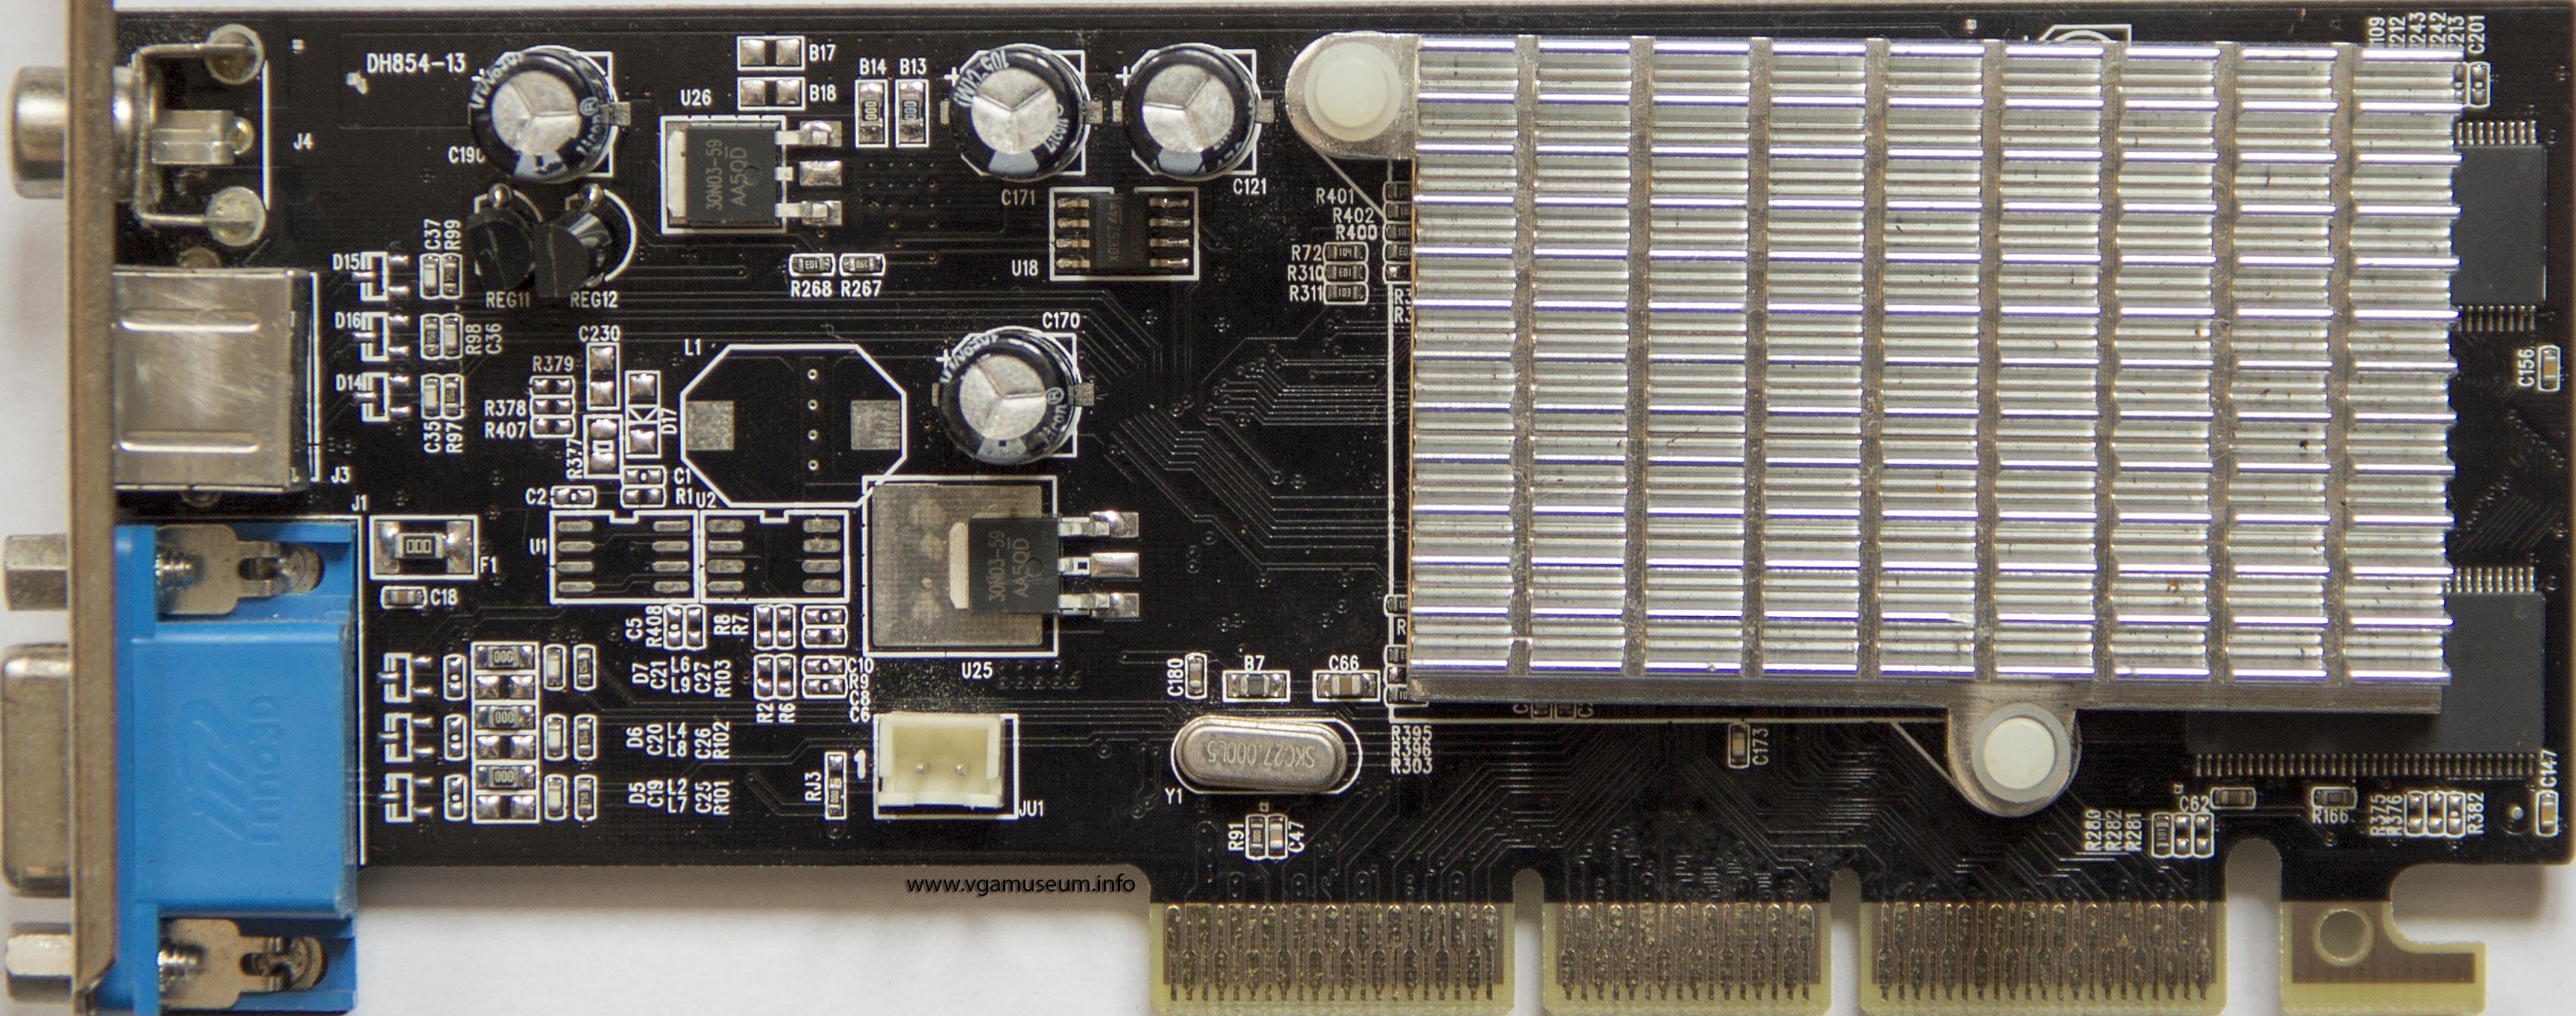 driver carte graphique nvidia geforce4 mx 4000